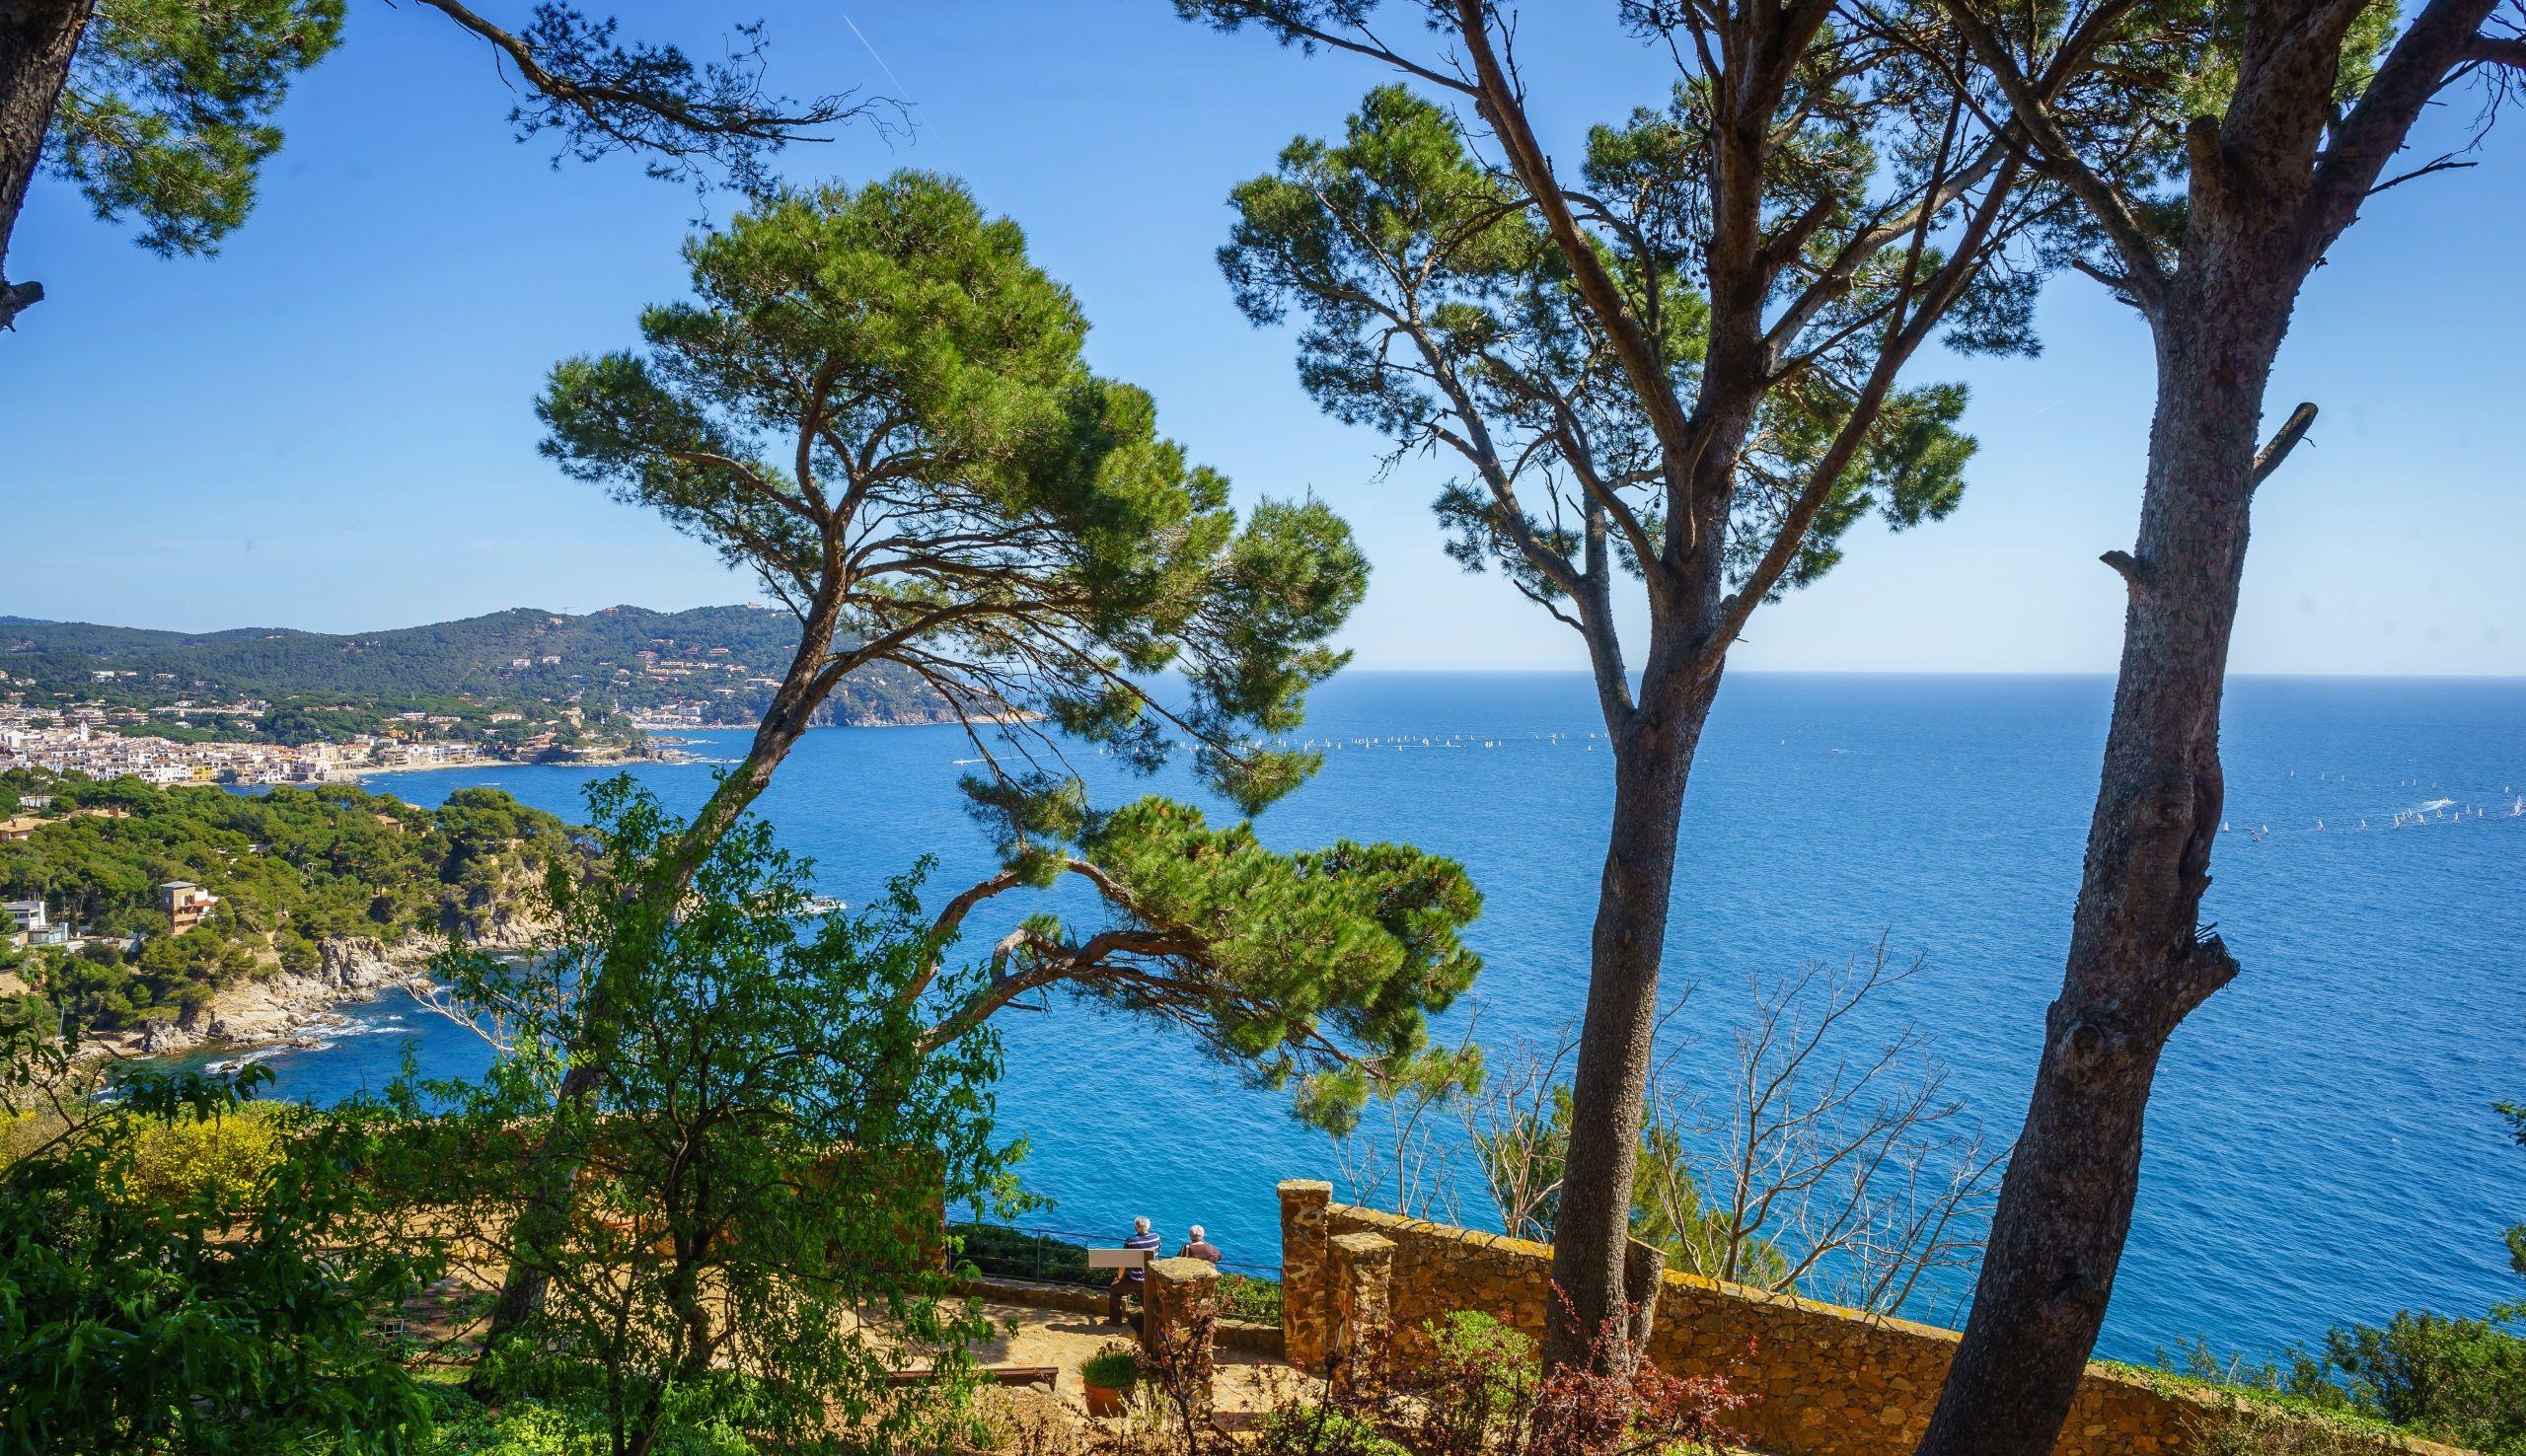 Fonds D Ecran Espagne Cote Mer Costa Brava Arbres Nature Image